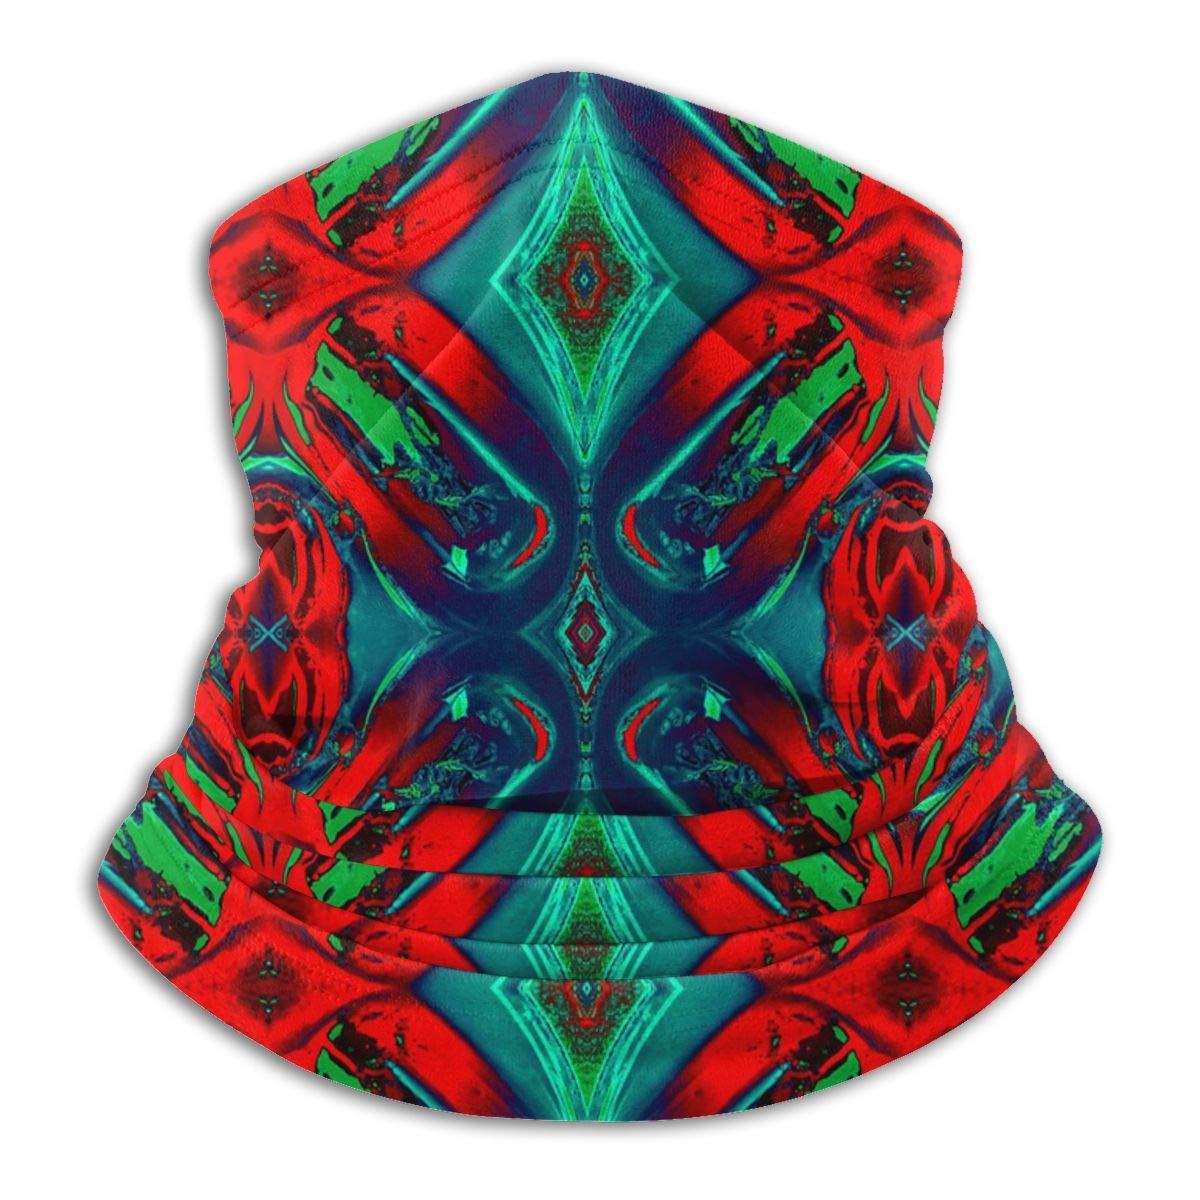 Windproof Ski Motorcycle Mask Phantasy World Dark 5 Printed Neck Warmer Gaiter Headwear Multifunctional Head Scarf